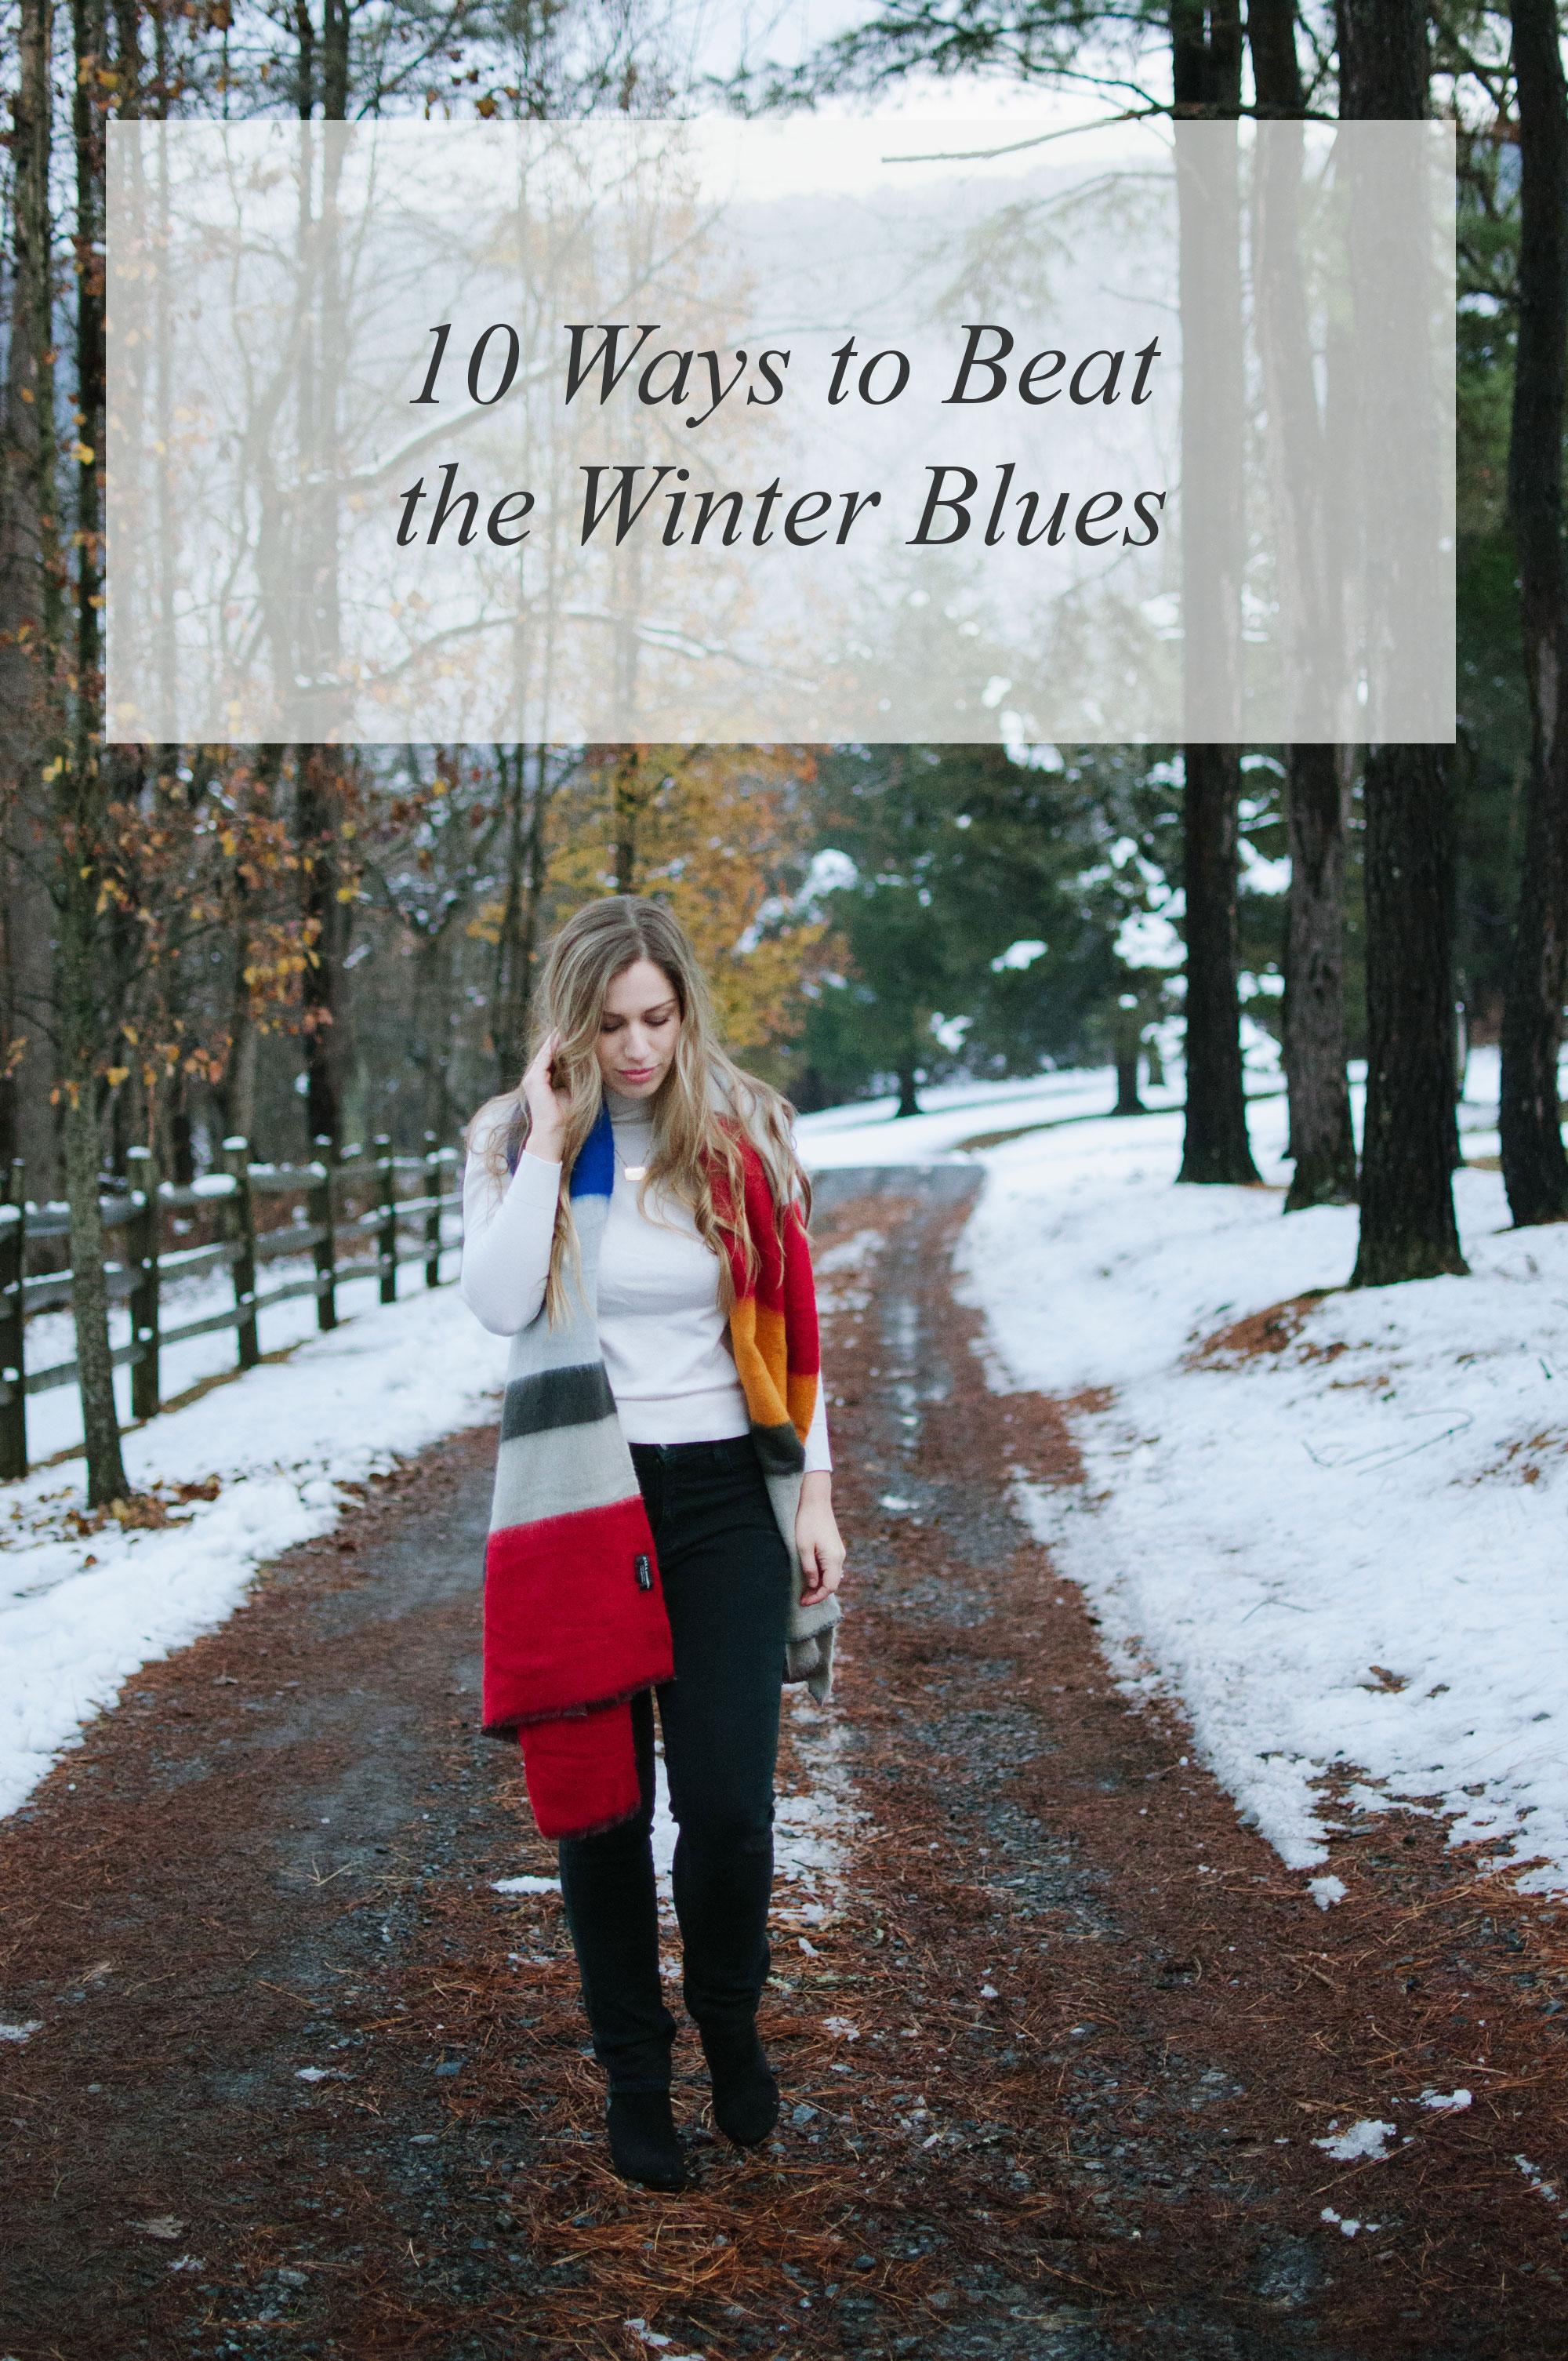 Beat the Winter Blues